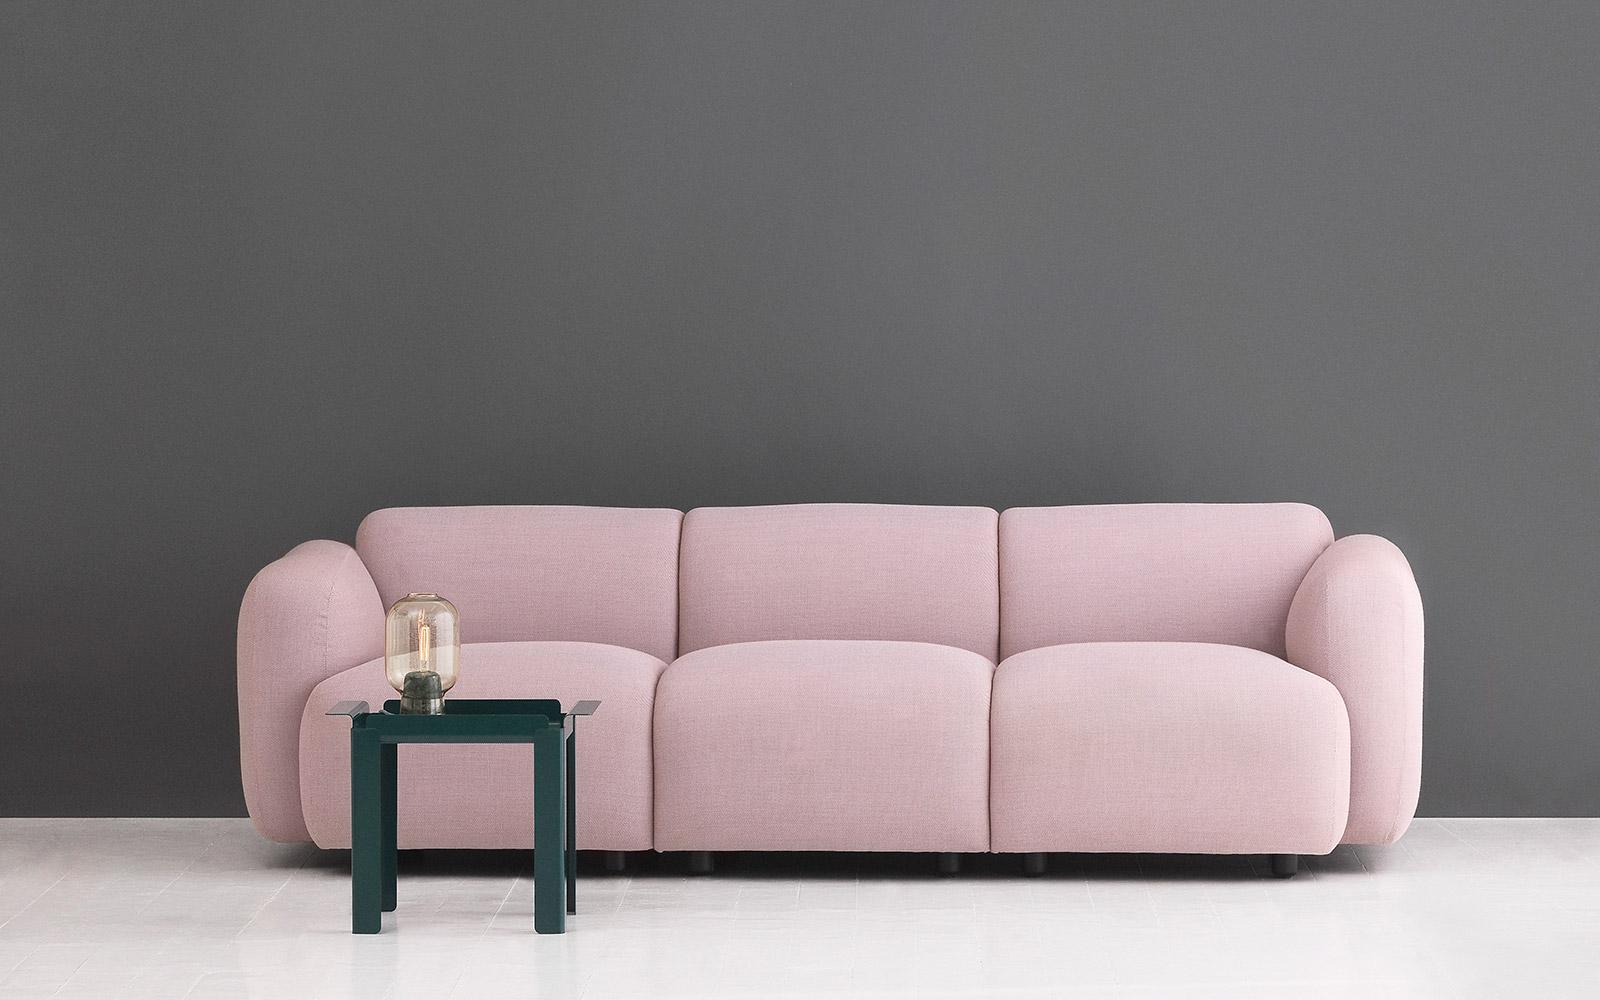 Curvy Scandinavian Design With An Edge Swell Sofa 3 Seater